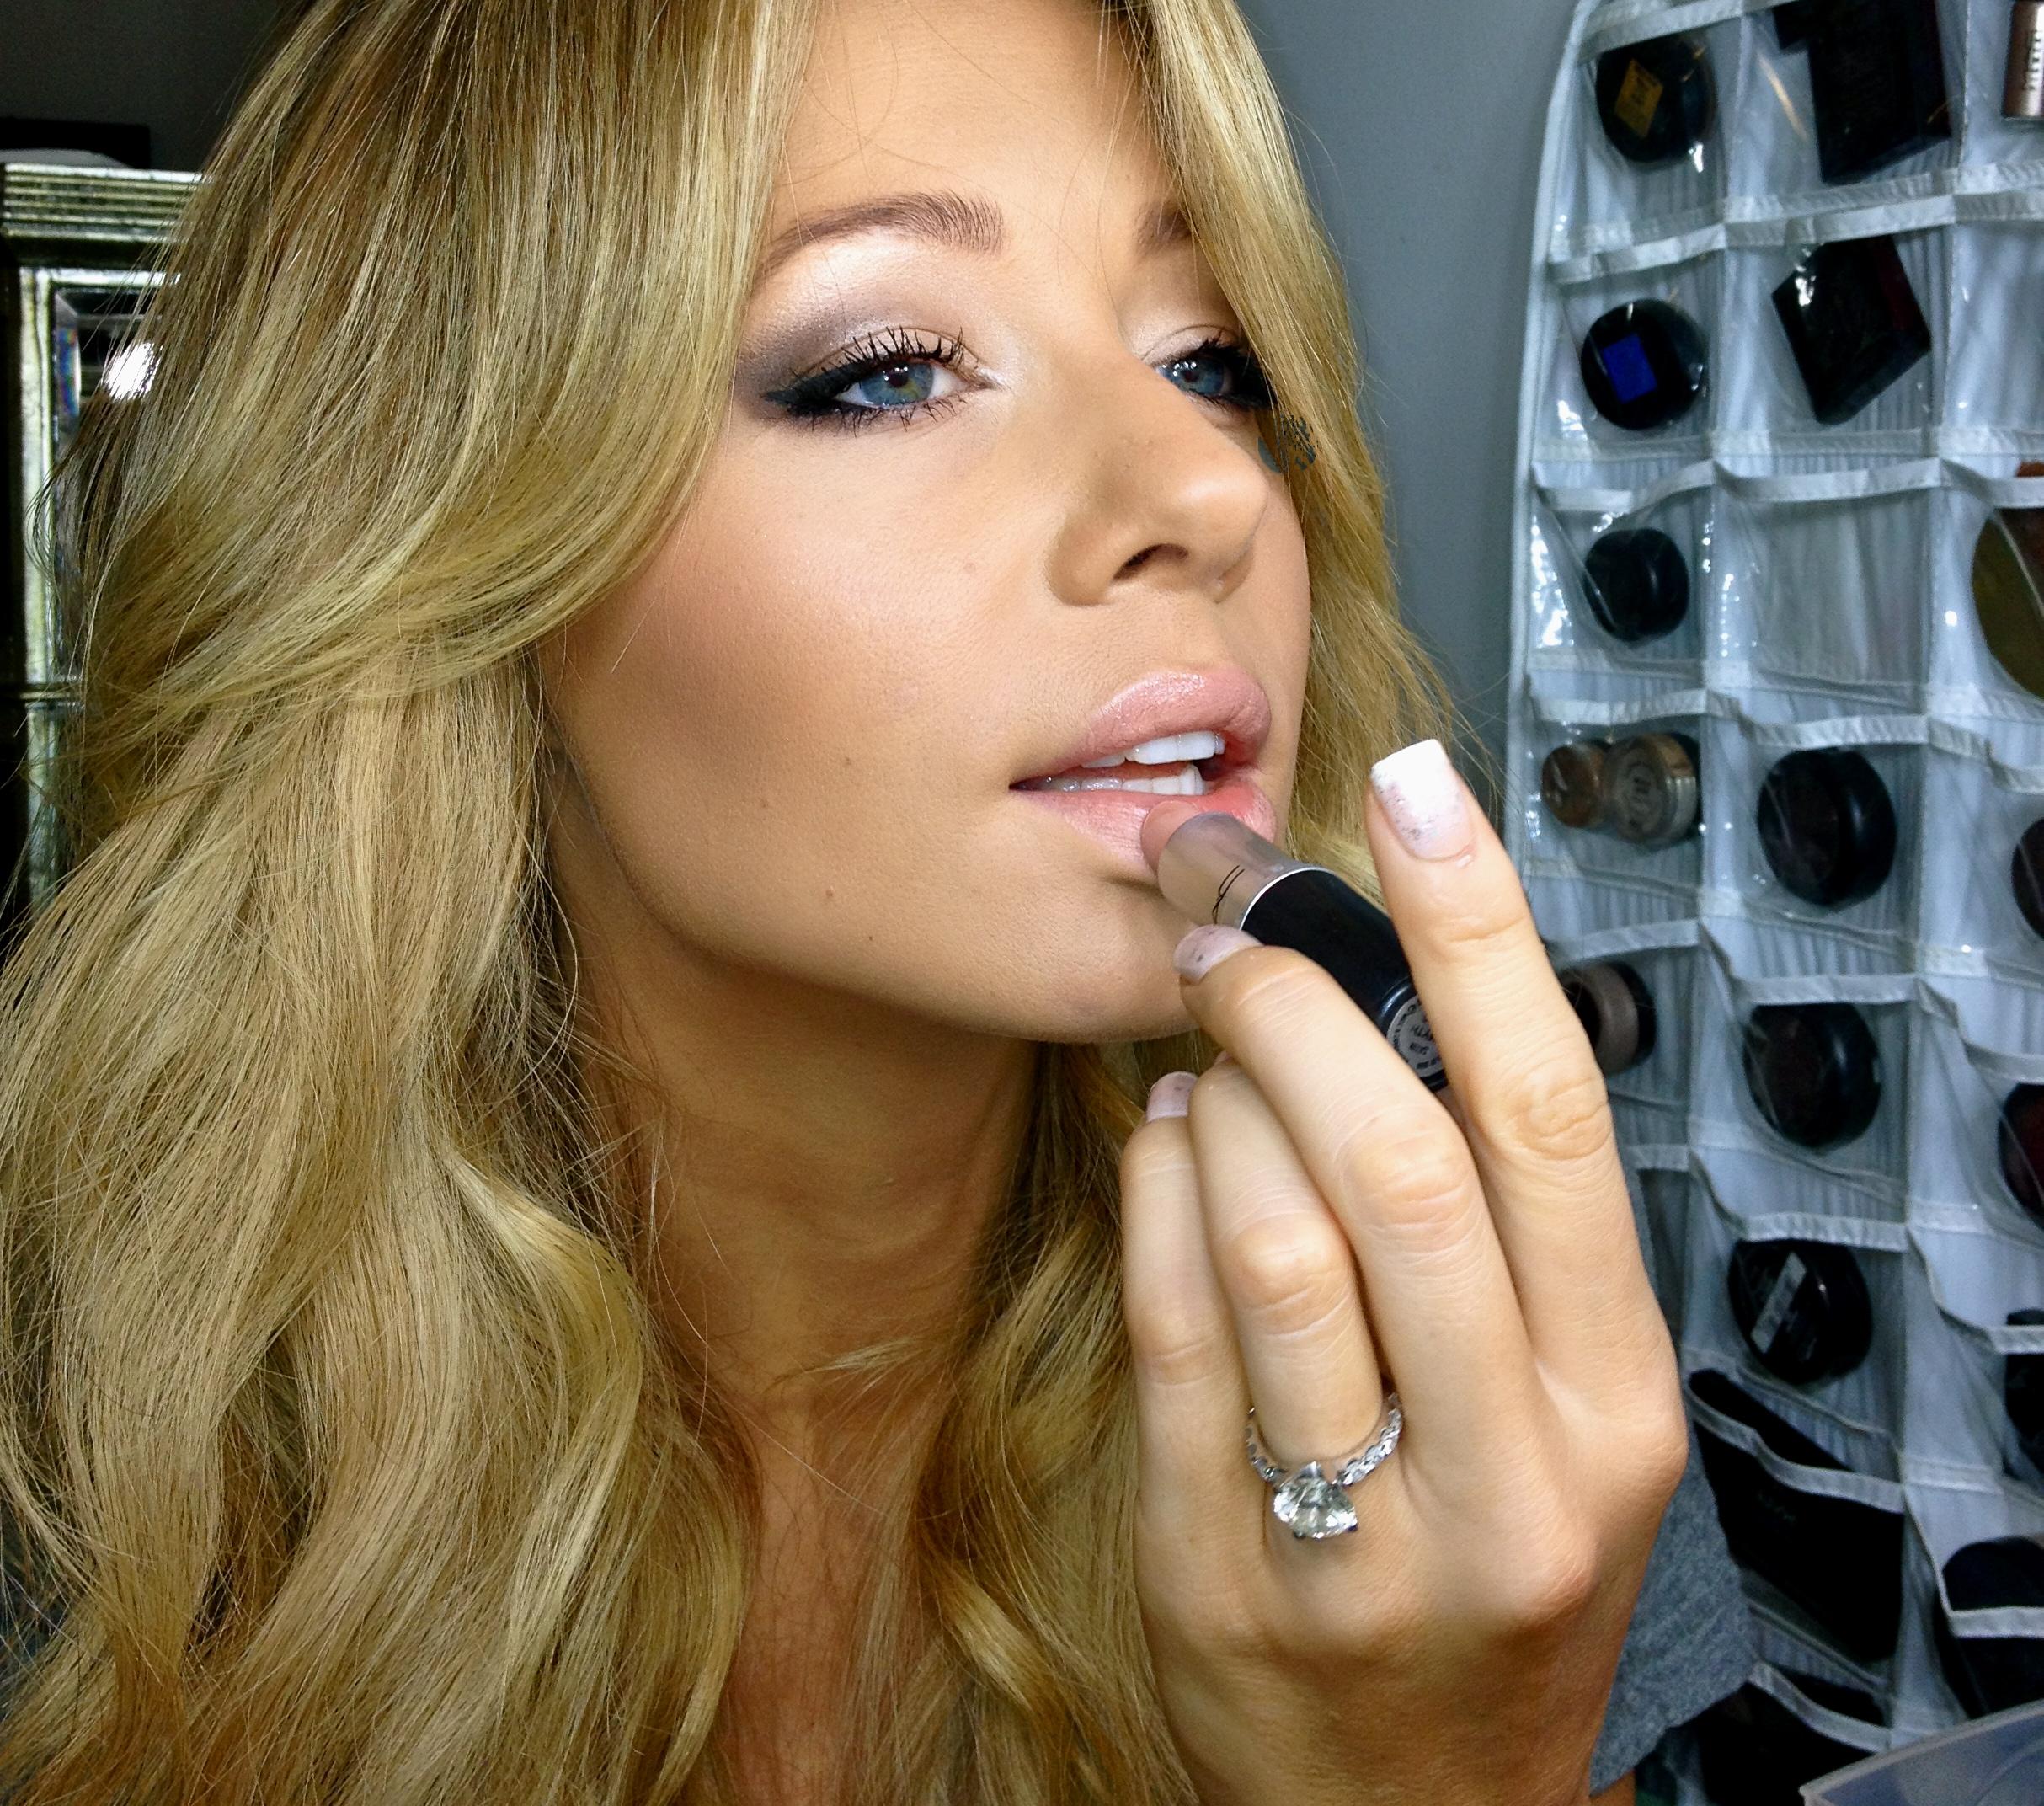 Sunset Blonde: My Favorite Makeup Look - VIVA GLAM MAGAZINE